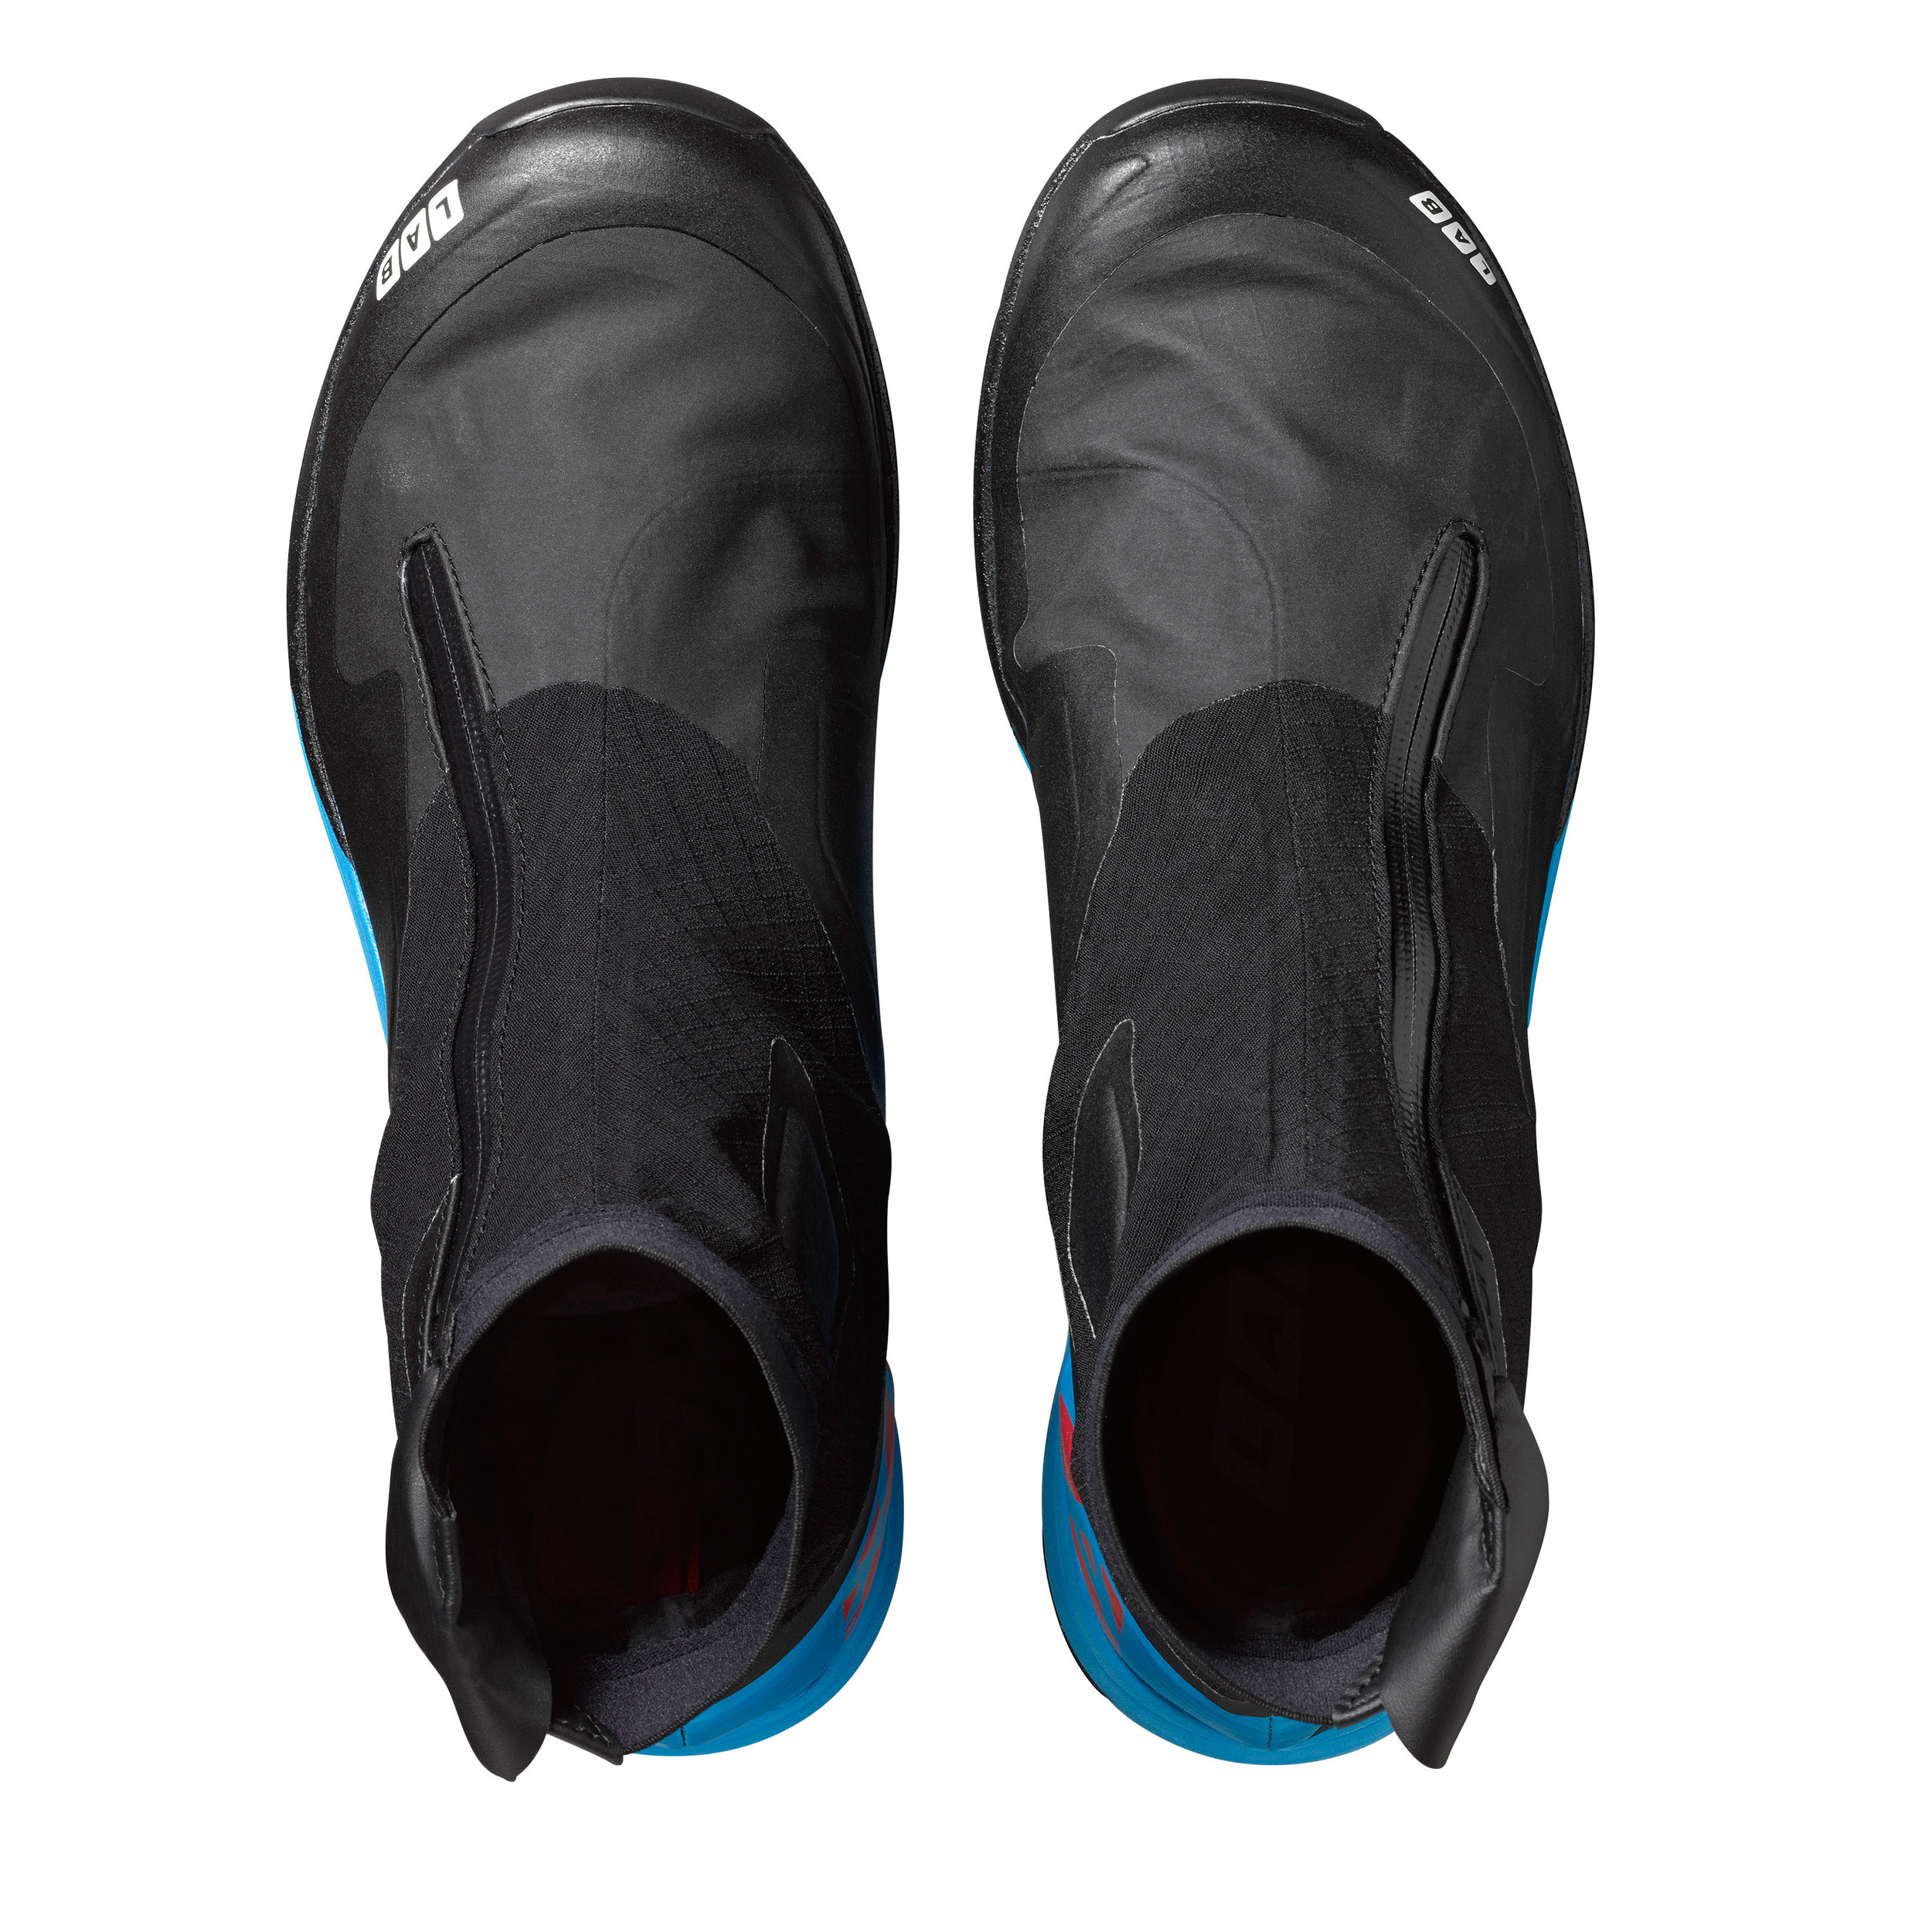 Salomon S-Lab XA Alpine Unisex Blue Black Trail Running Sports Shoes  Trainers 0e37e66d976